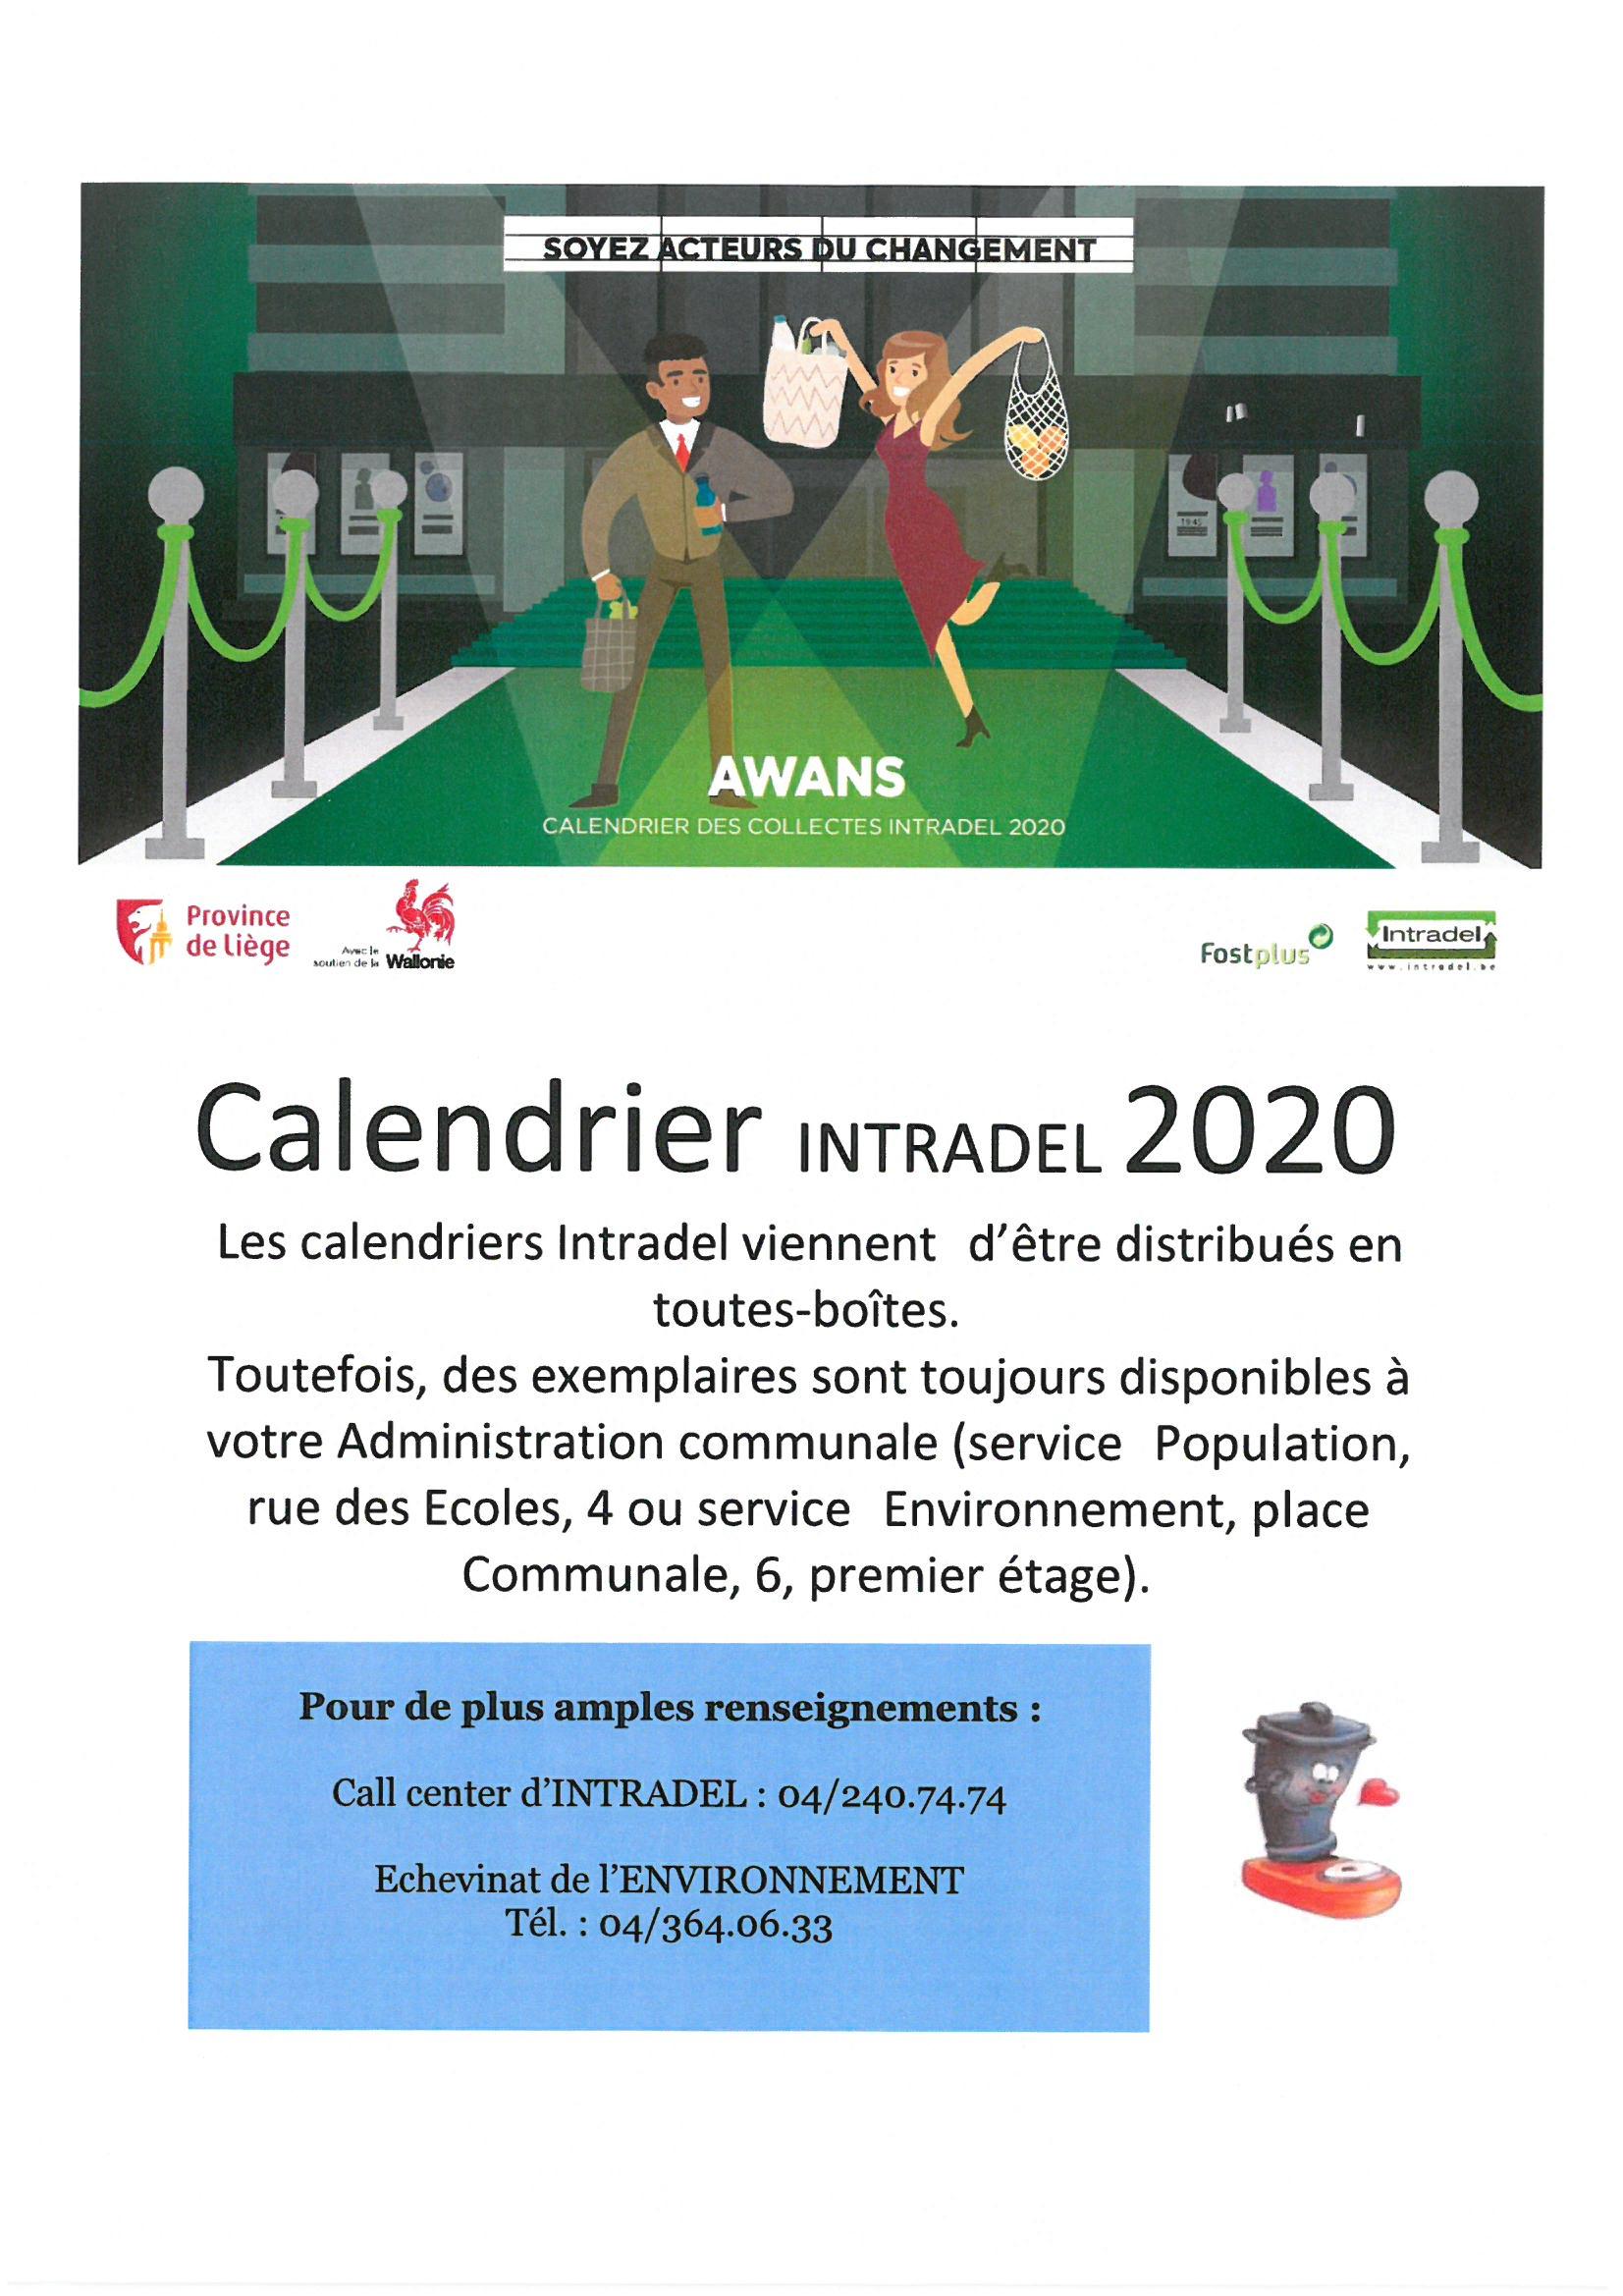 Calendrier INTRADEL 2020